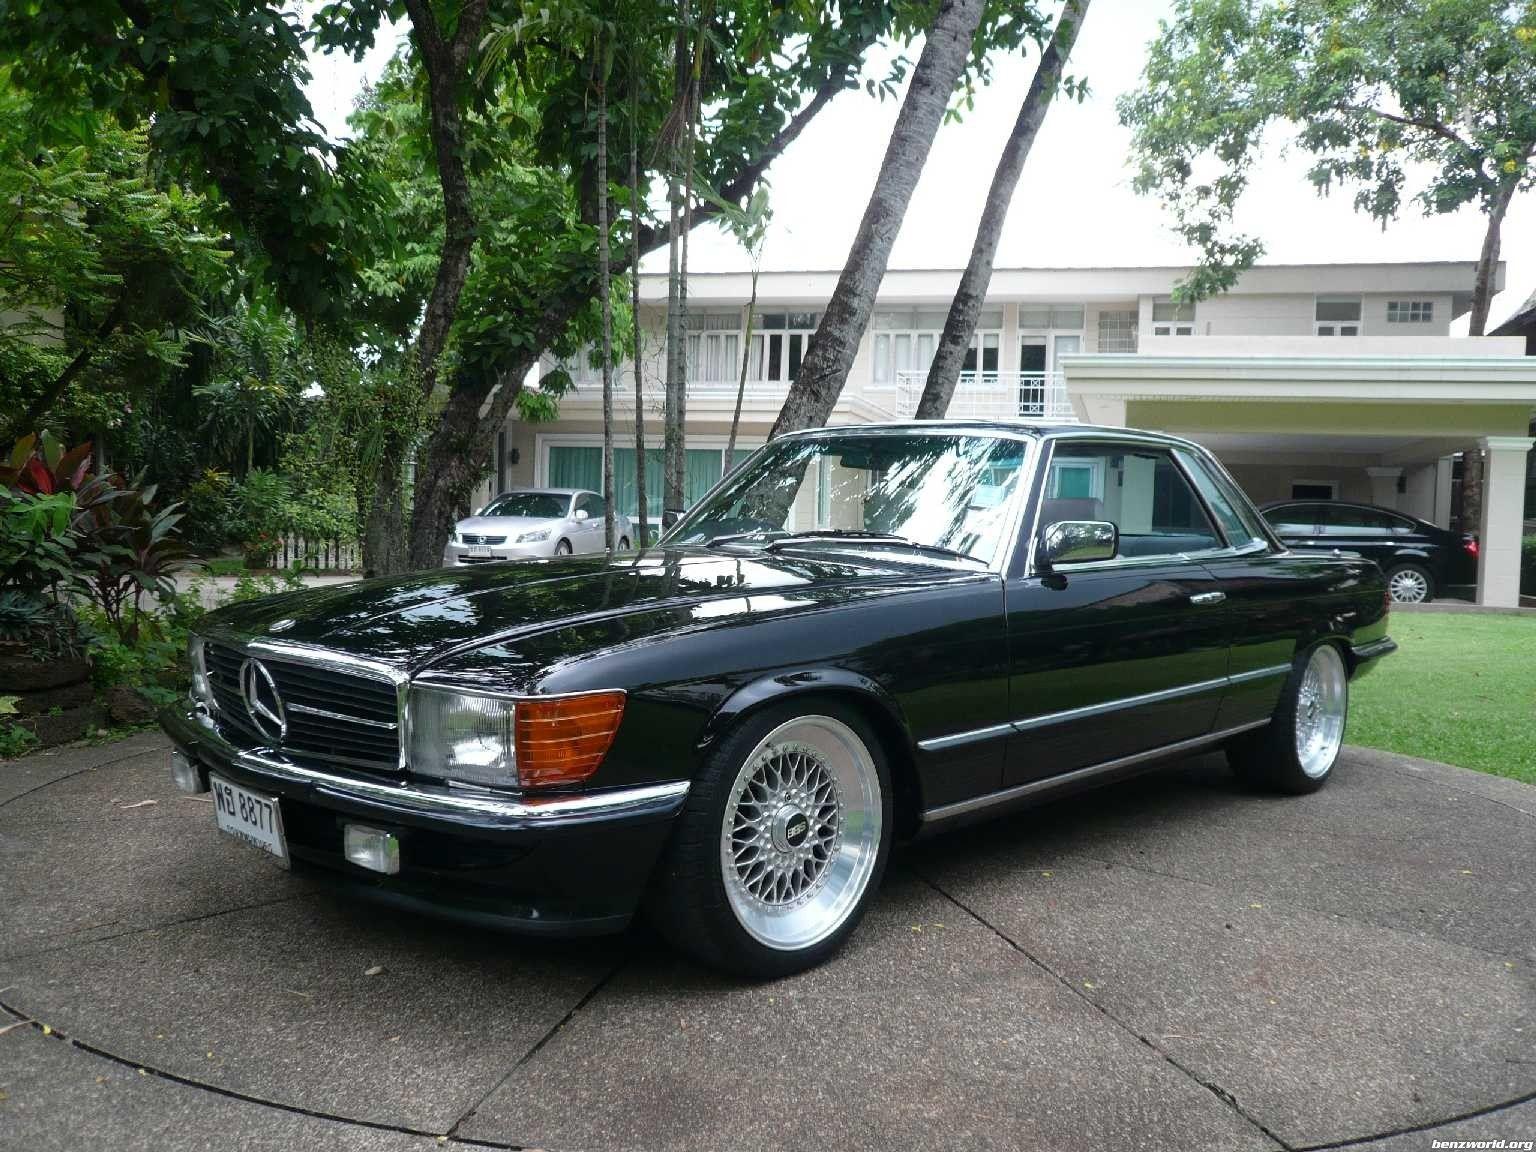 Mercedes 350 slc c107 google search my dream garage for Okay google mercedes benz